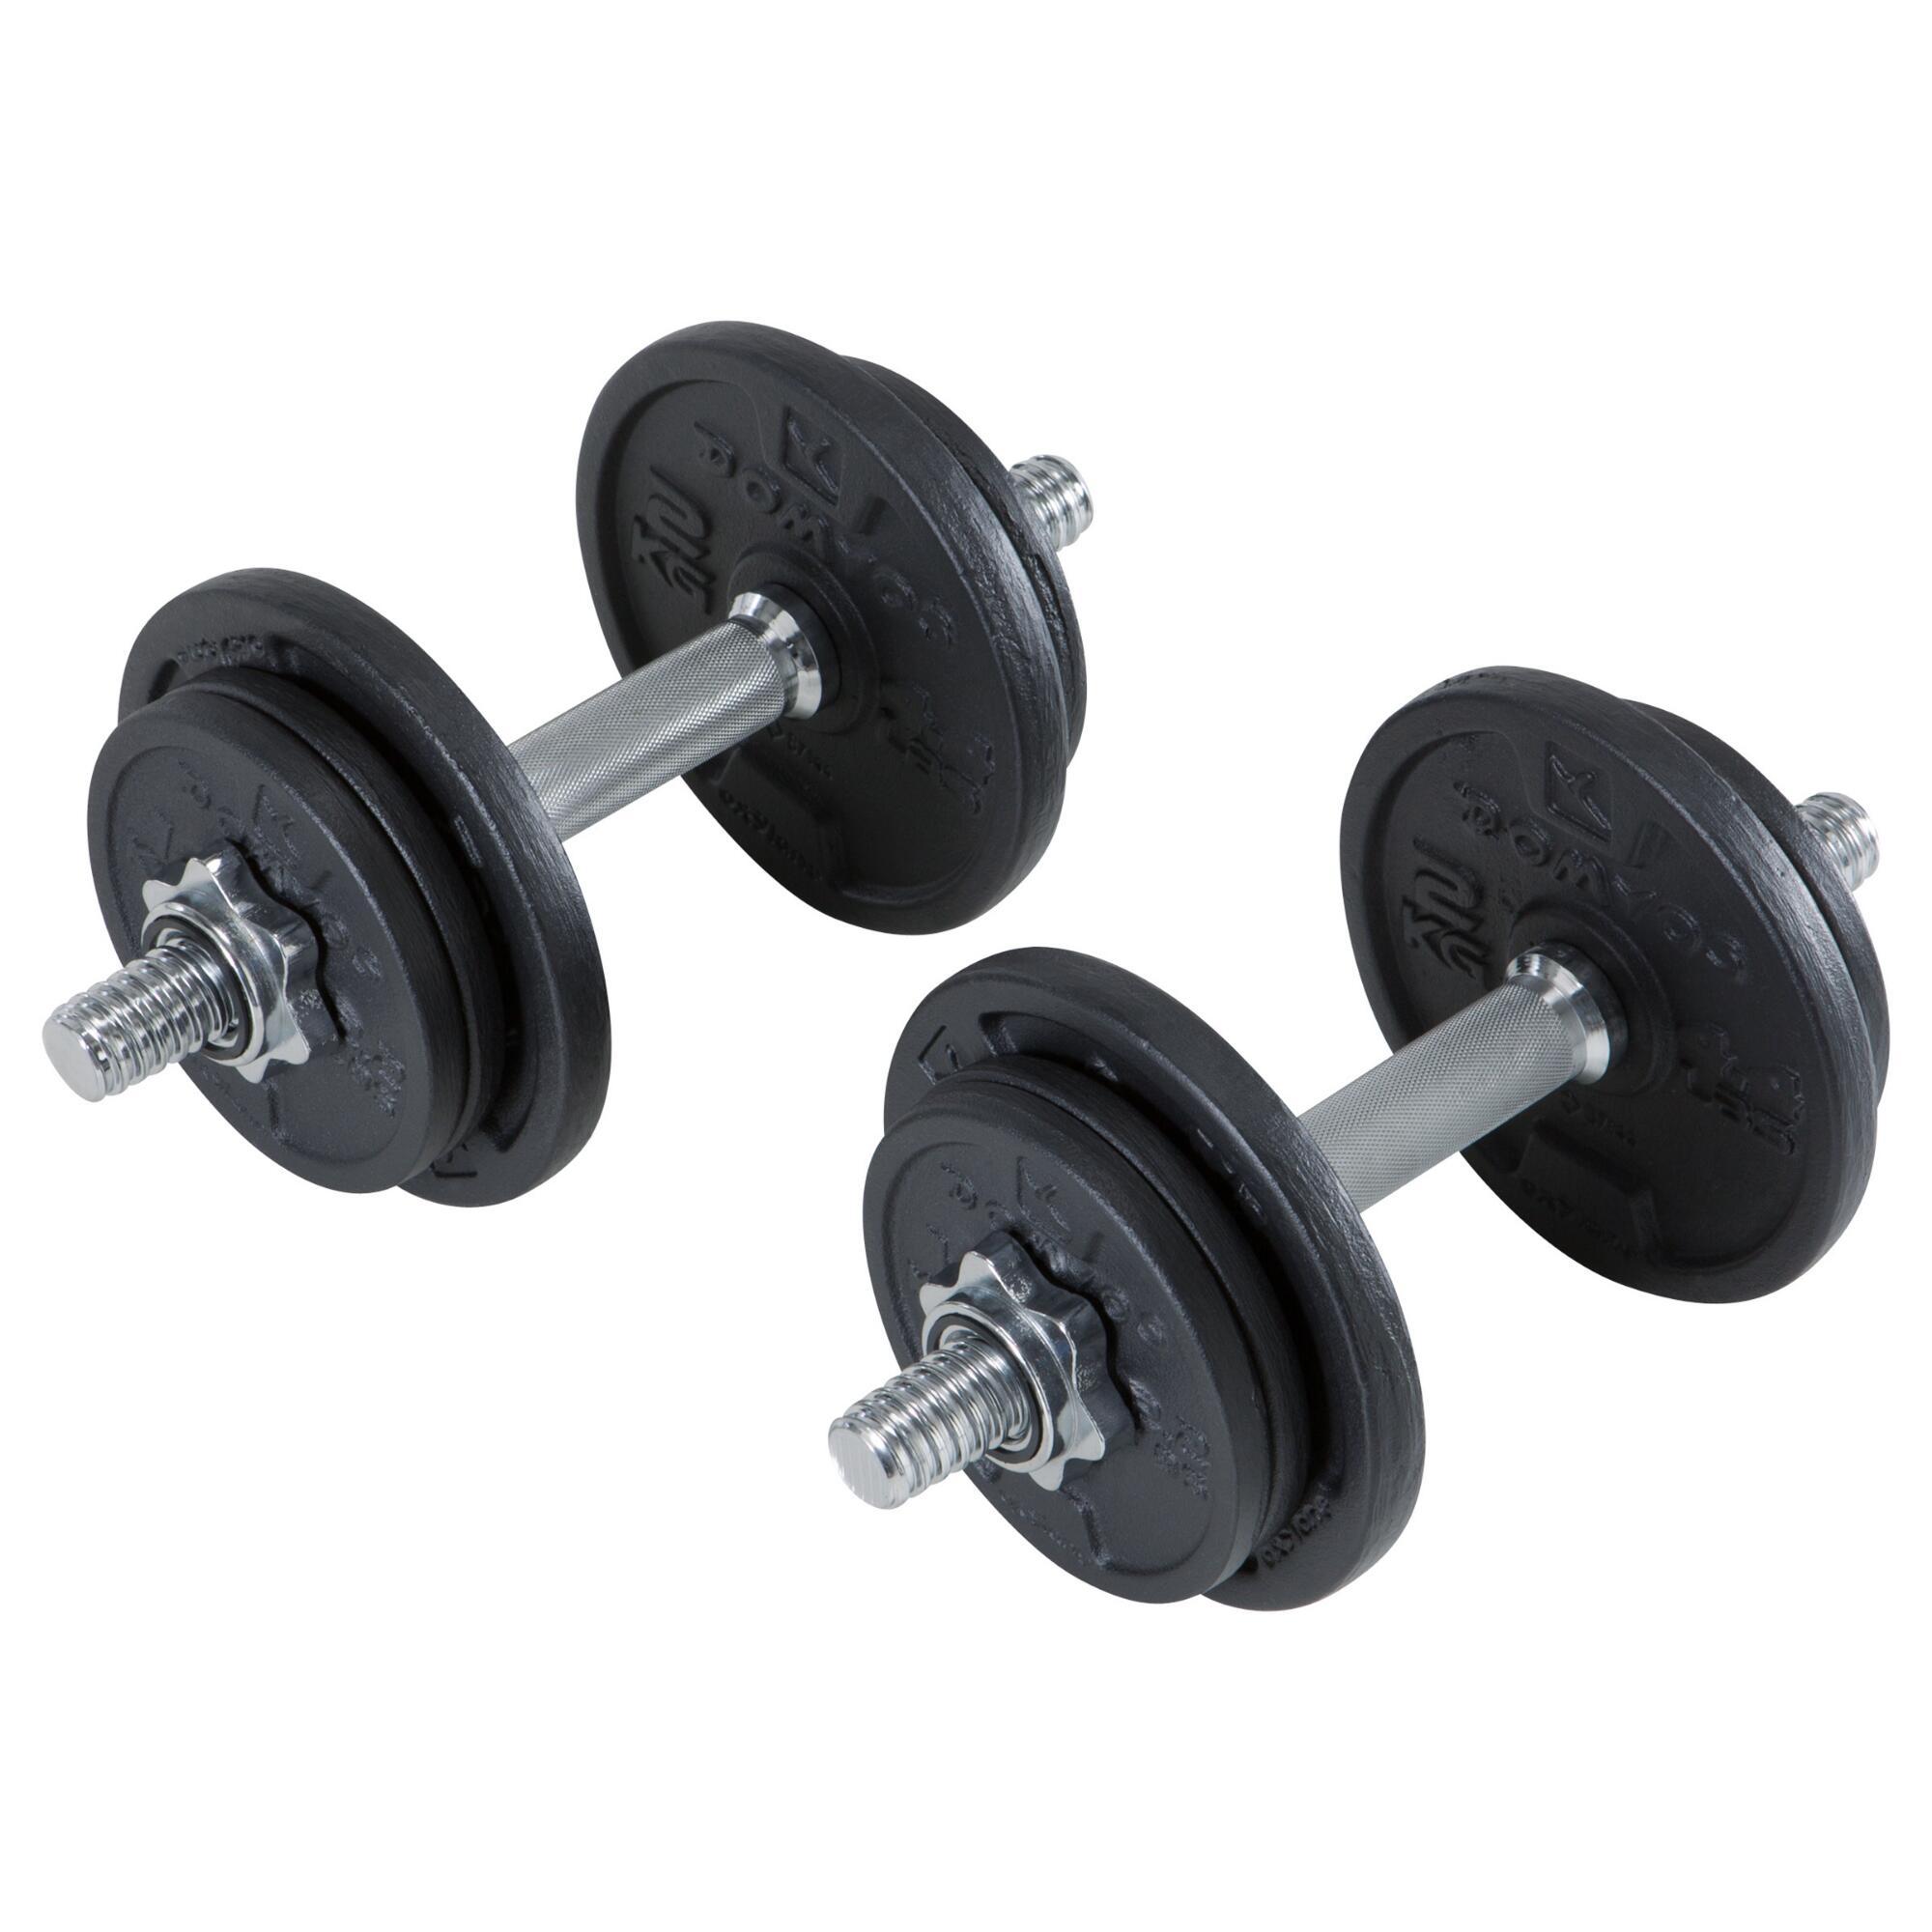 Kurzhantelset 10kg Kurzhantel Hantel Gewichte Guss 10 Kg Fitness Domyos